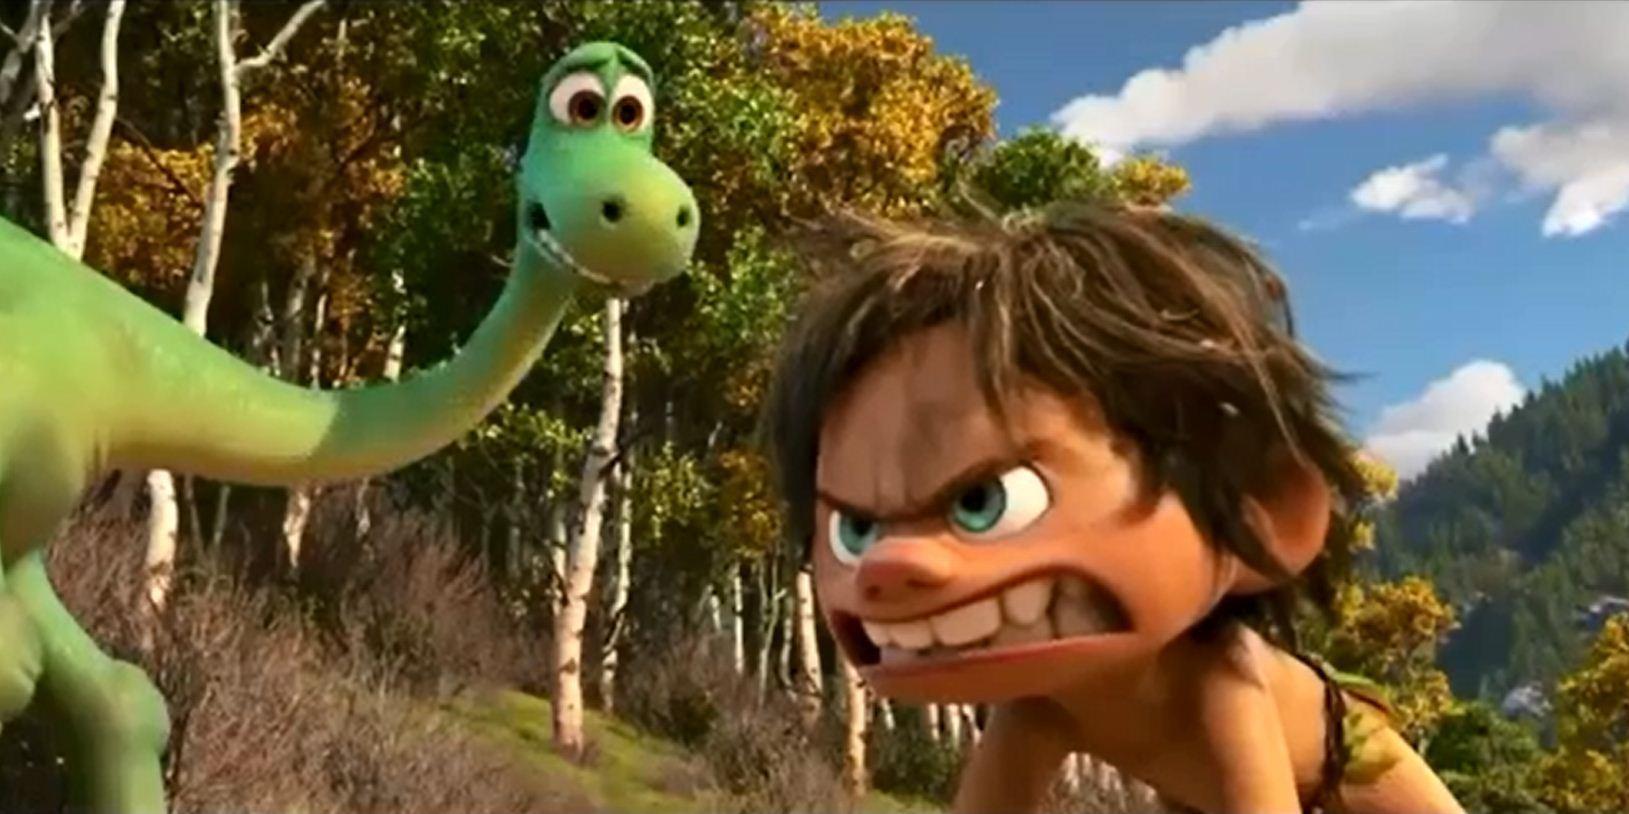 Triceratops The Good Dinosaur: New 'The Good Dinosaur' Trailer Shows Dino-boy Friendship